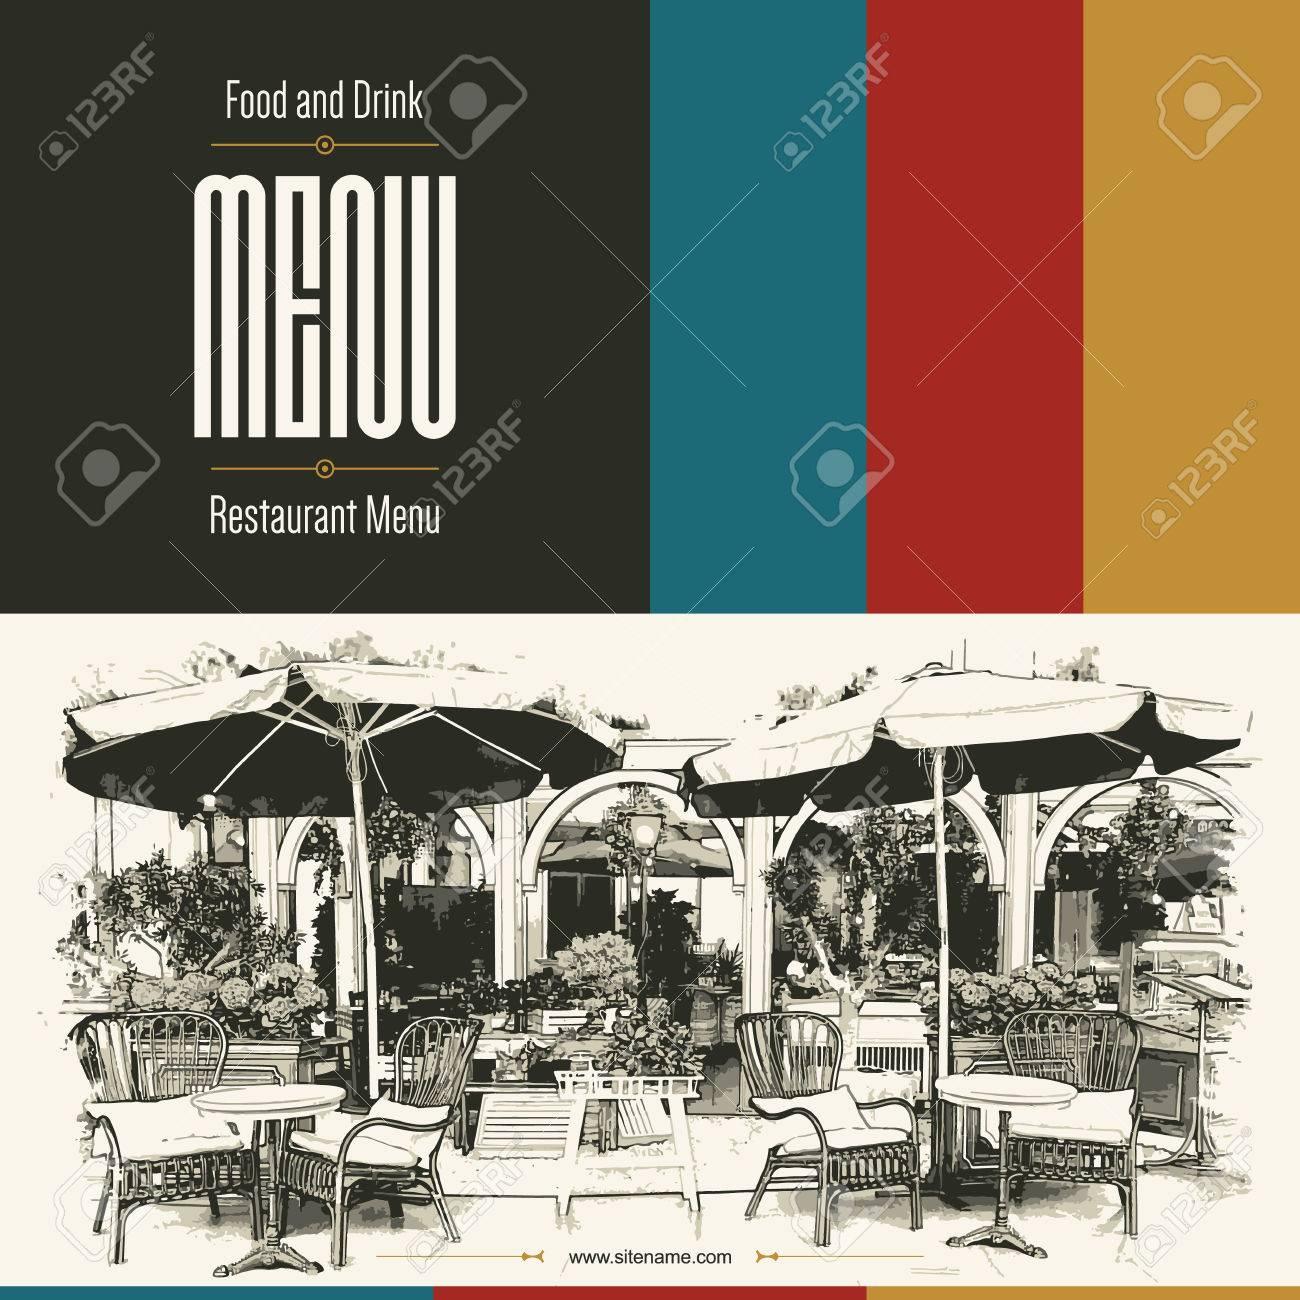 Retro restaurant menu design. With a sketch pictures - 43961264